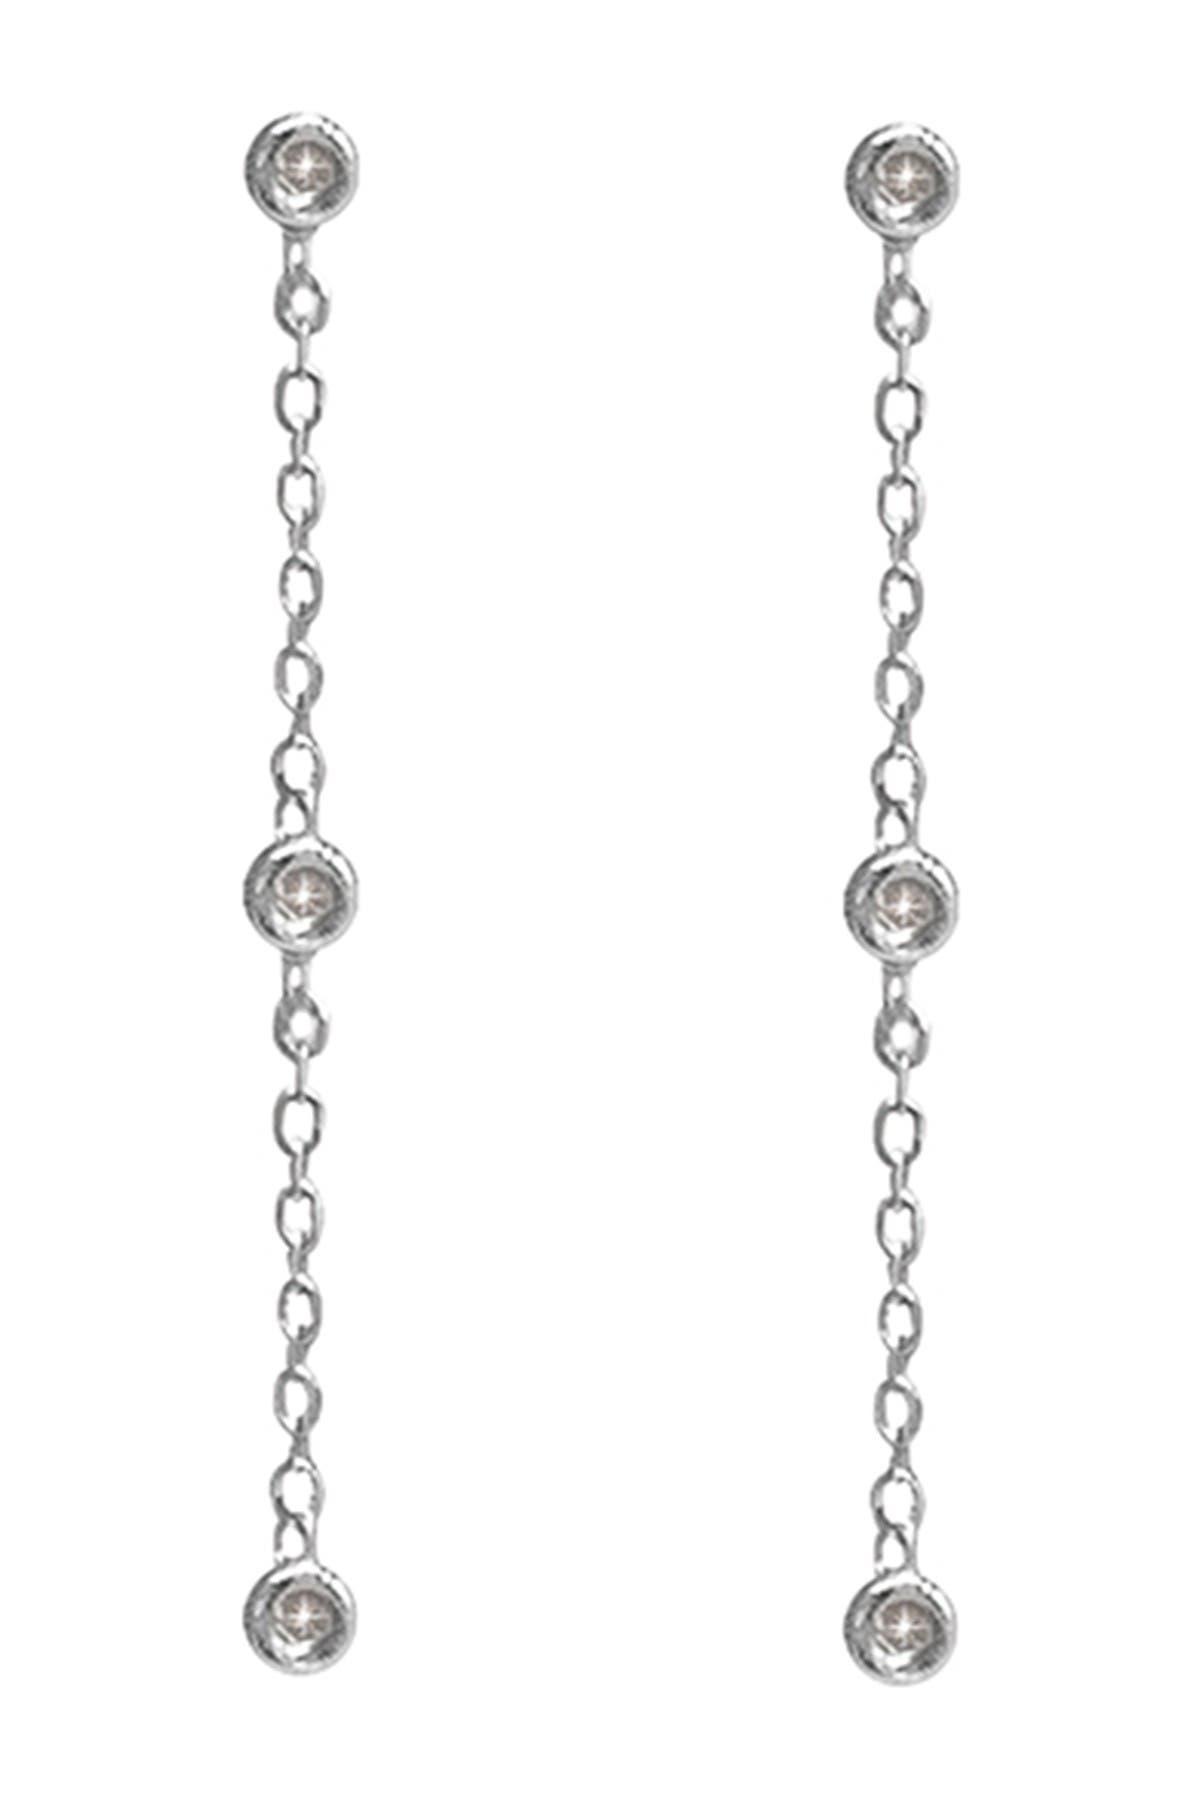 Image of ADORNIA Fine White Rhodium Plated Bezel Set Diamond Chain Drop Earrings - 0.10 ctw